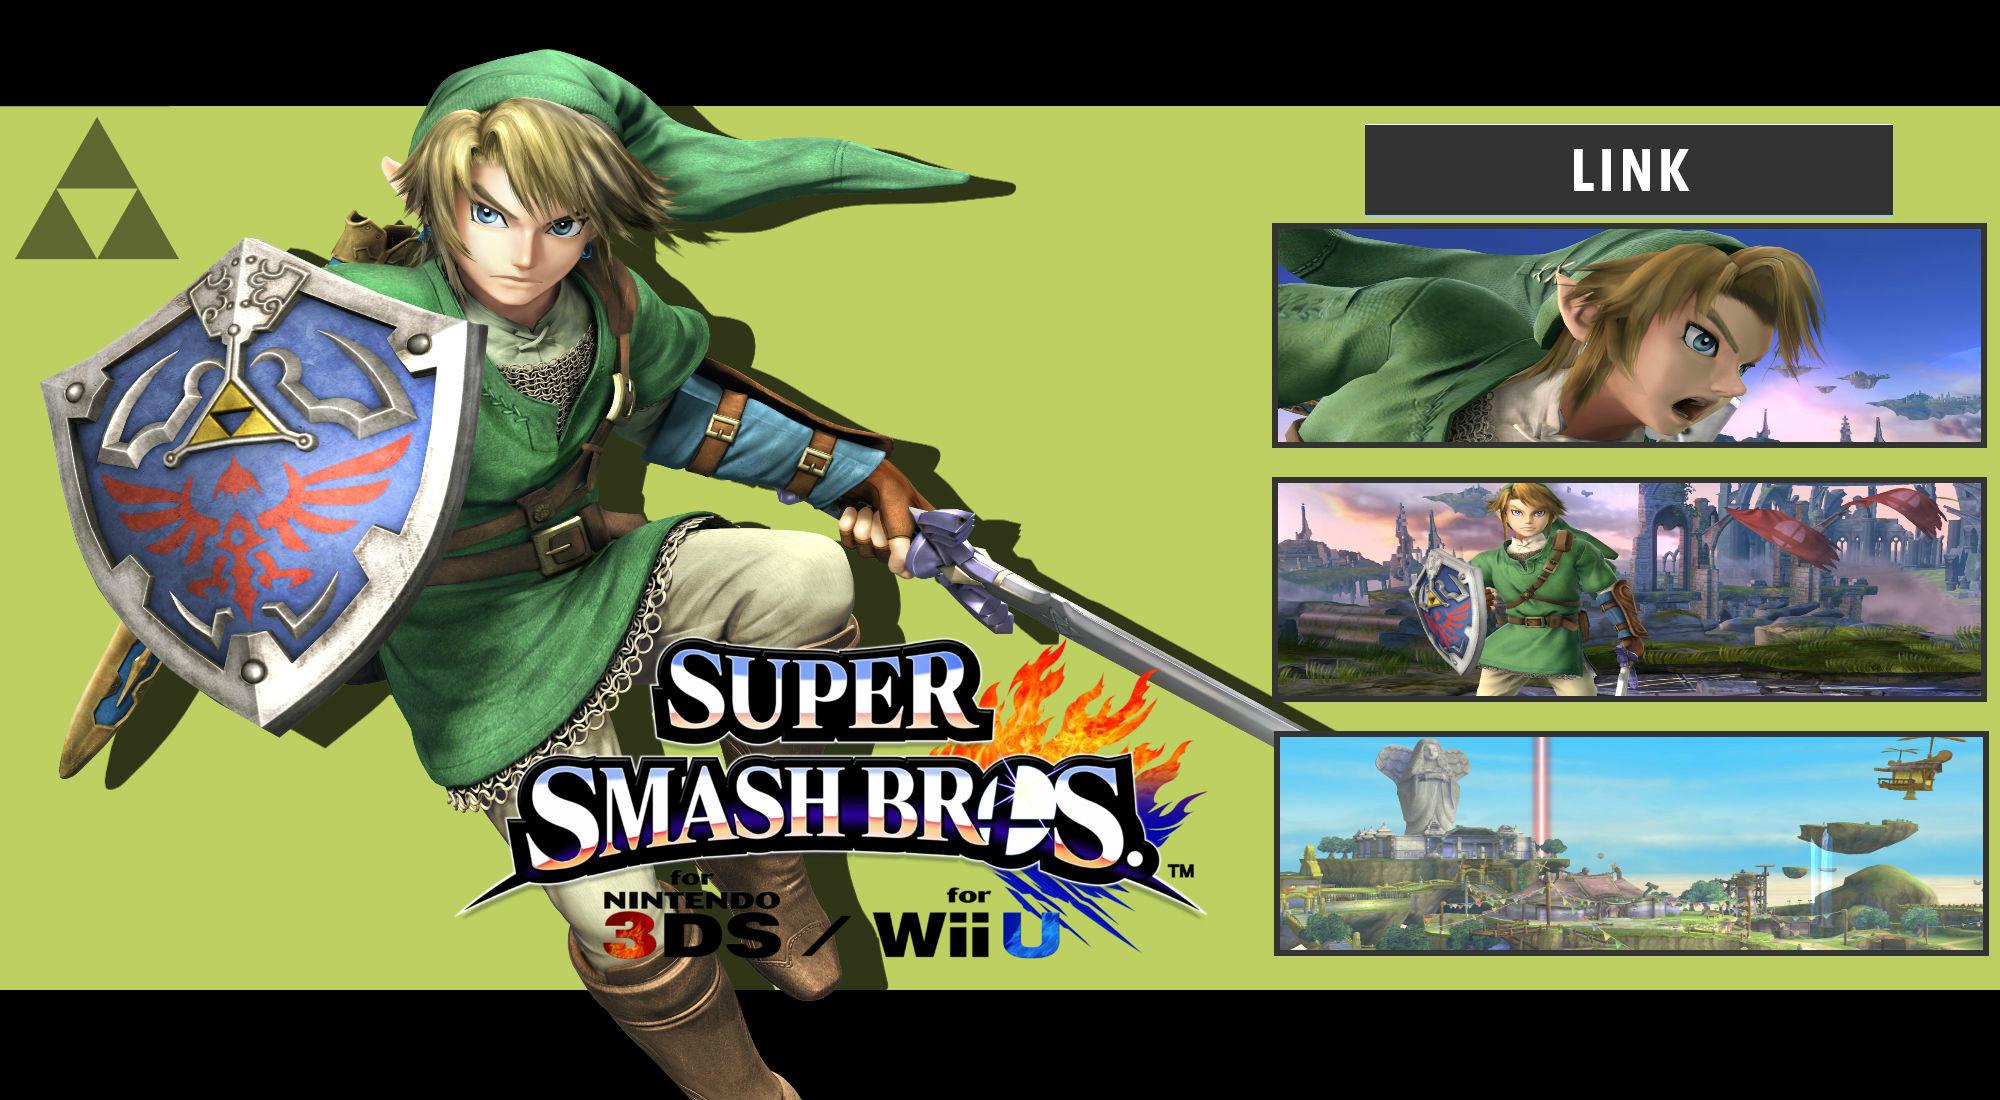 … DaKidGaming Super Smash Bros. 3DS/Wii U – Link Wallpaper by DaKidGaming